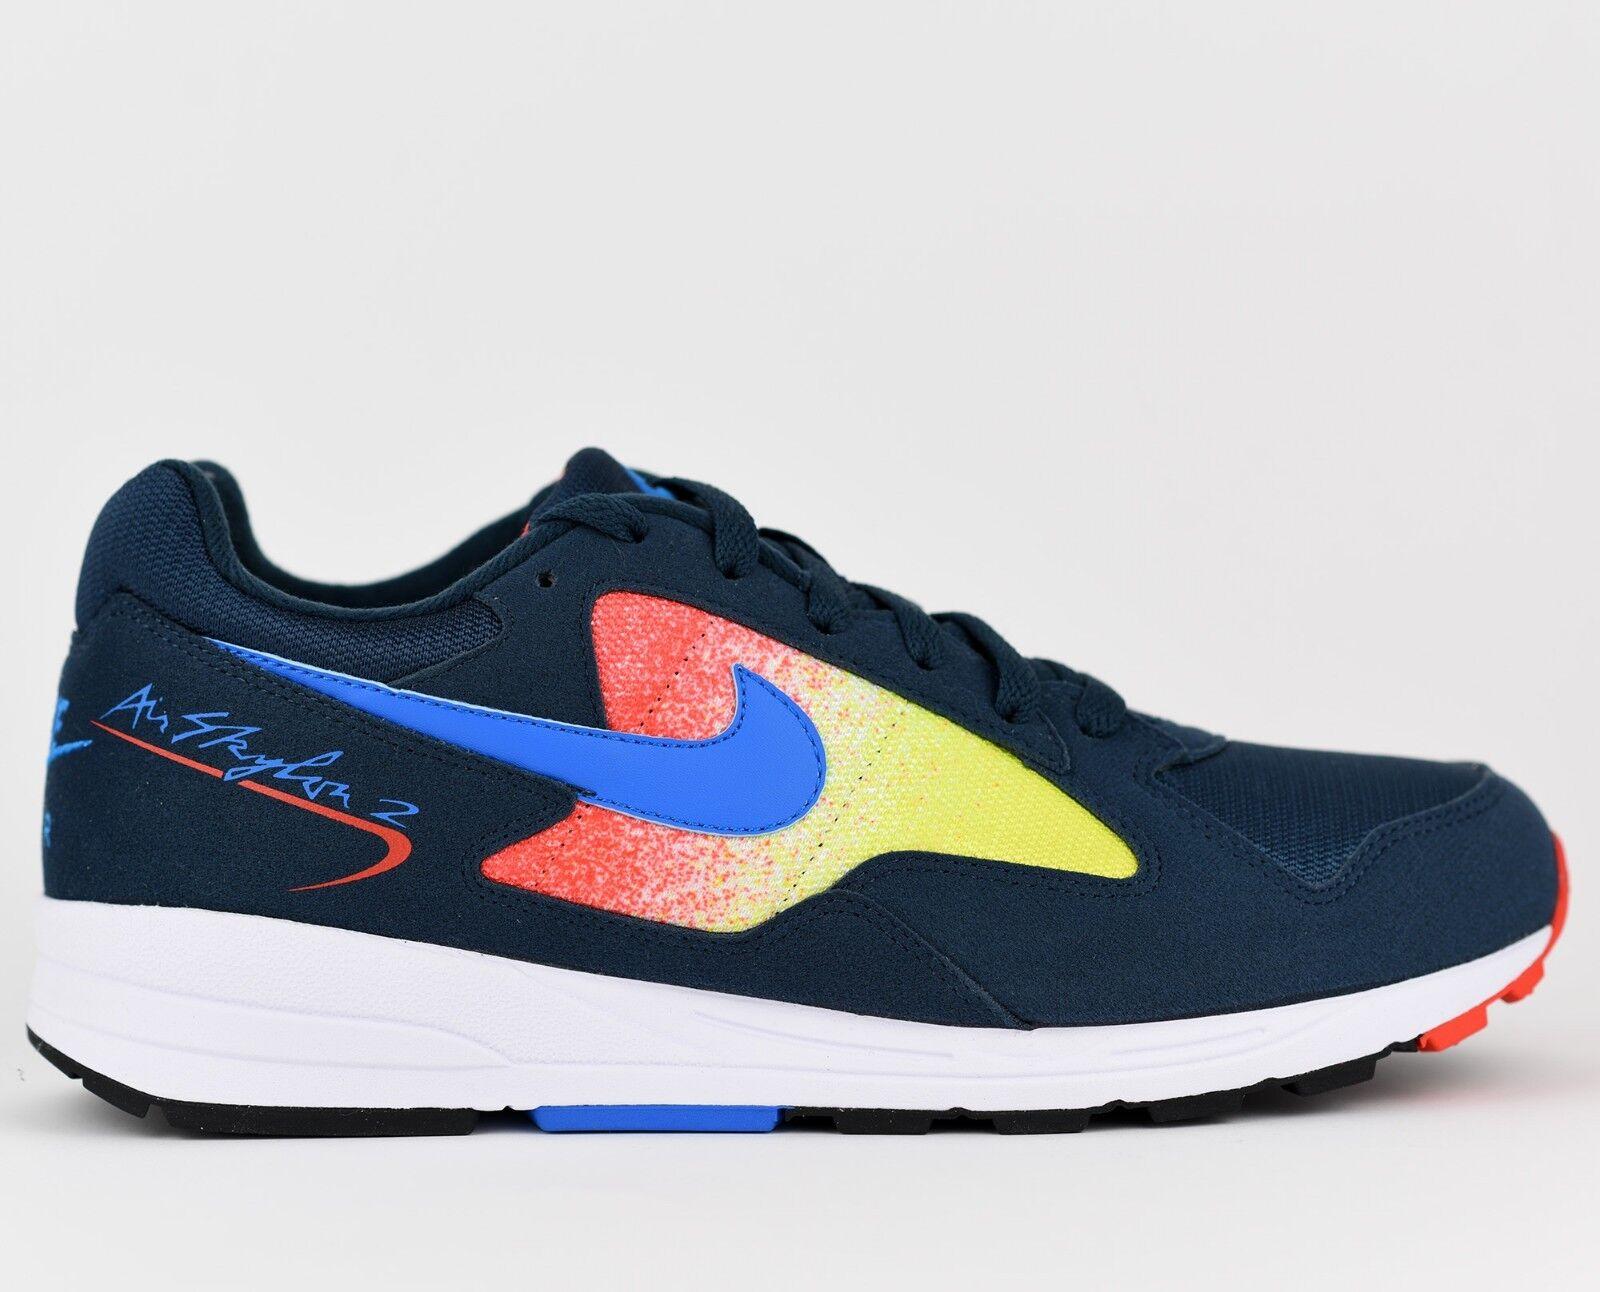 Nike Air Skylon II 2 Men Lifestyle Sneakers shoes New Armory Navy AO1551-400